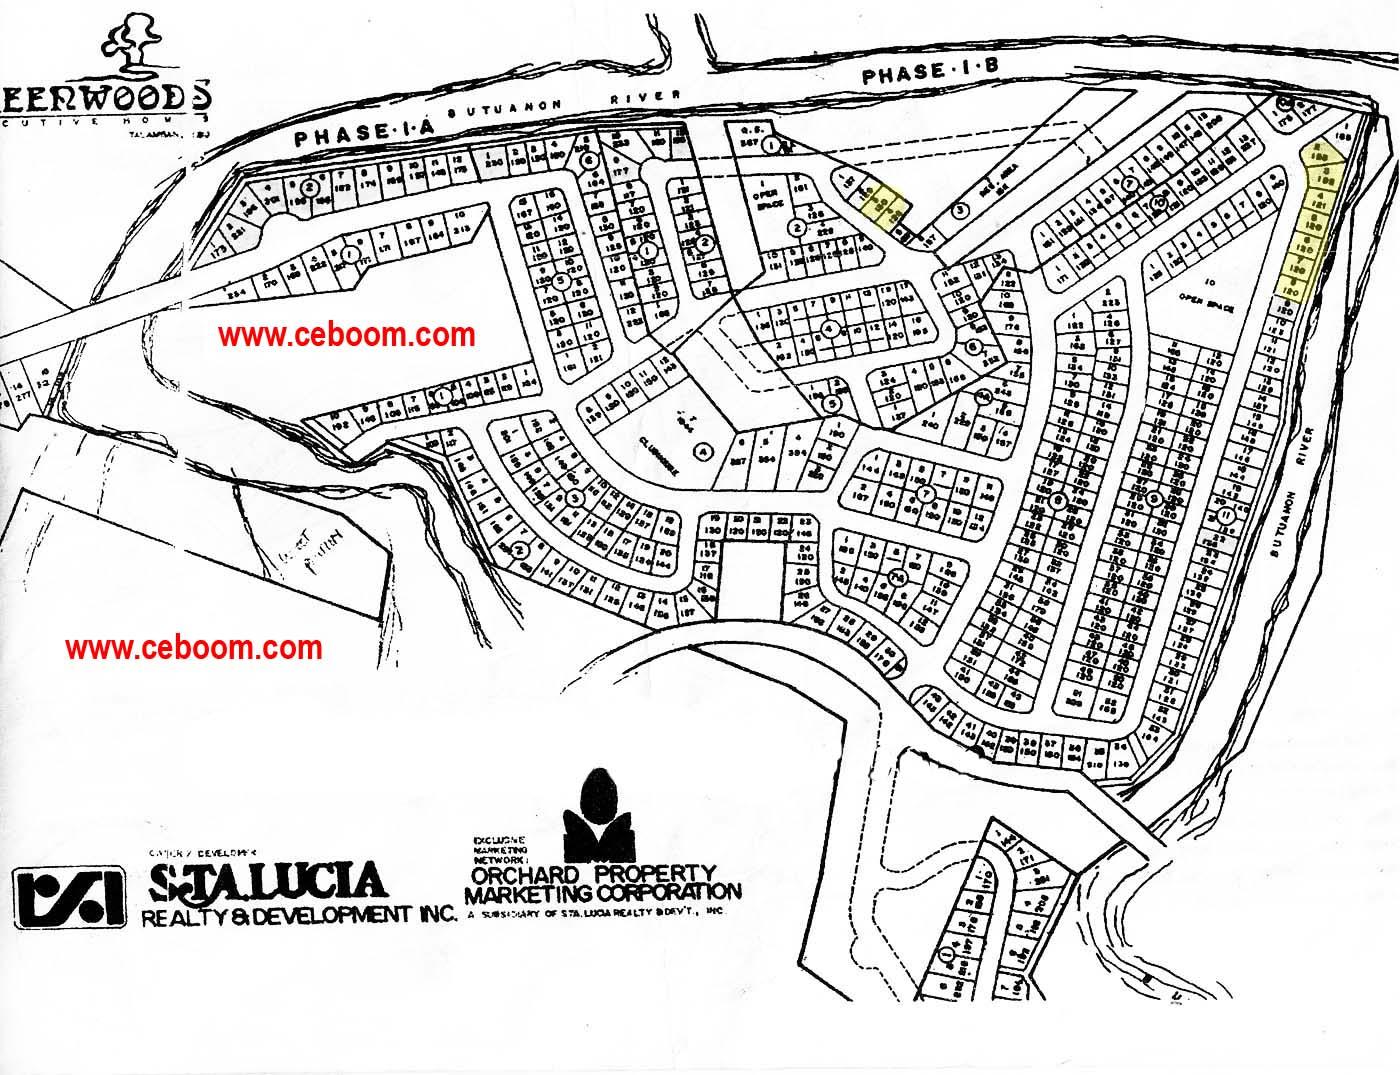 Cebu Real Estate Properties Greenwoods Executive Homes